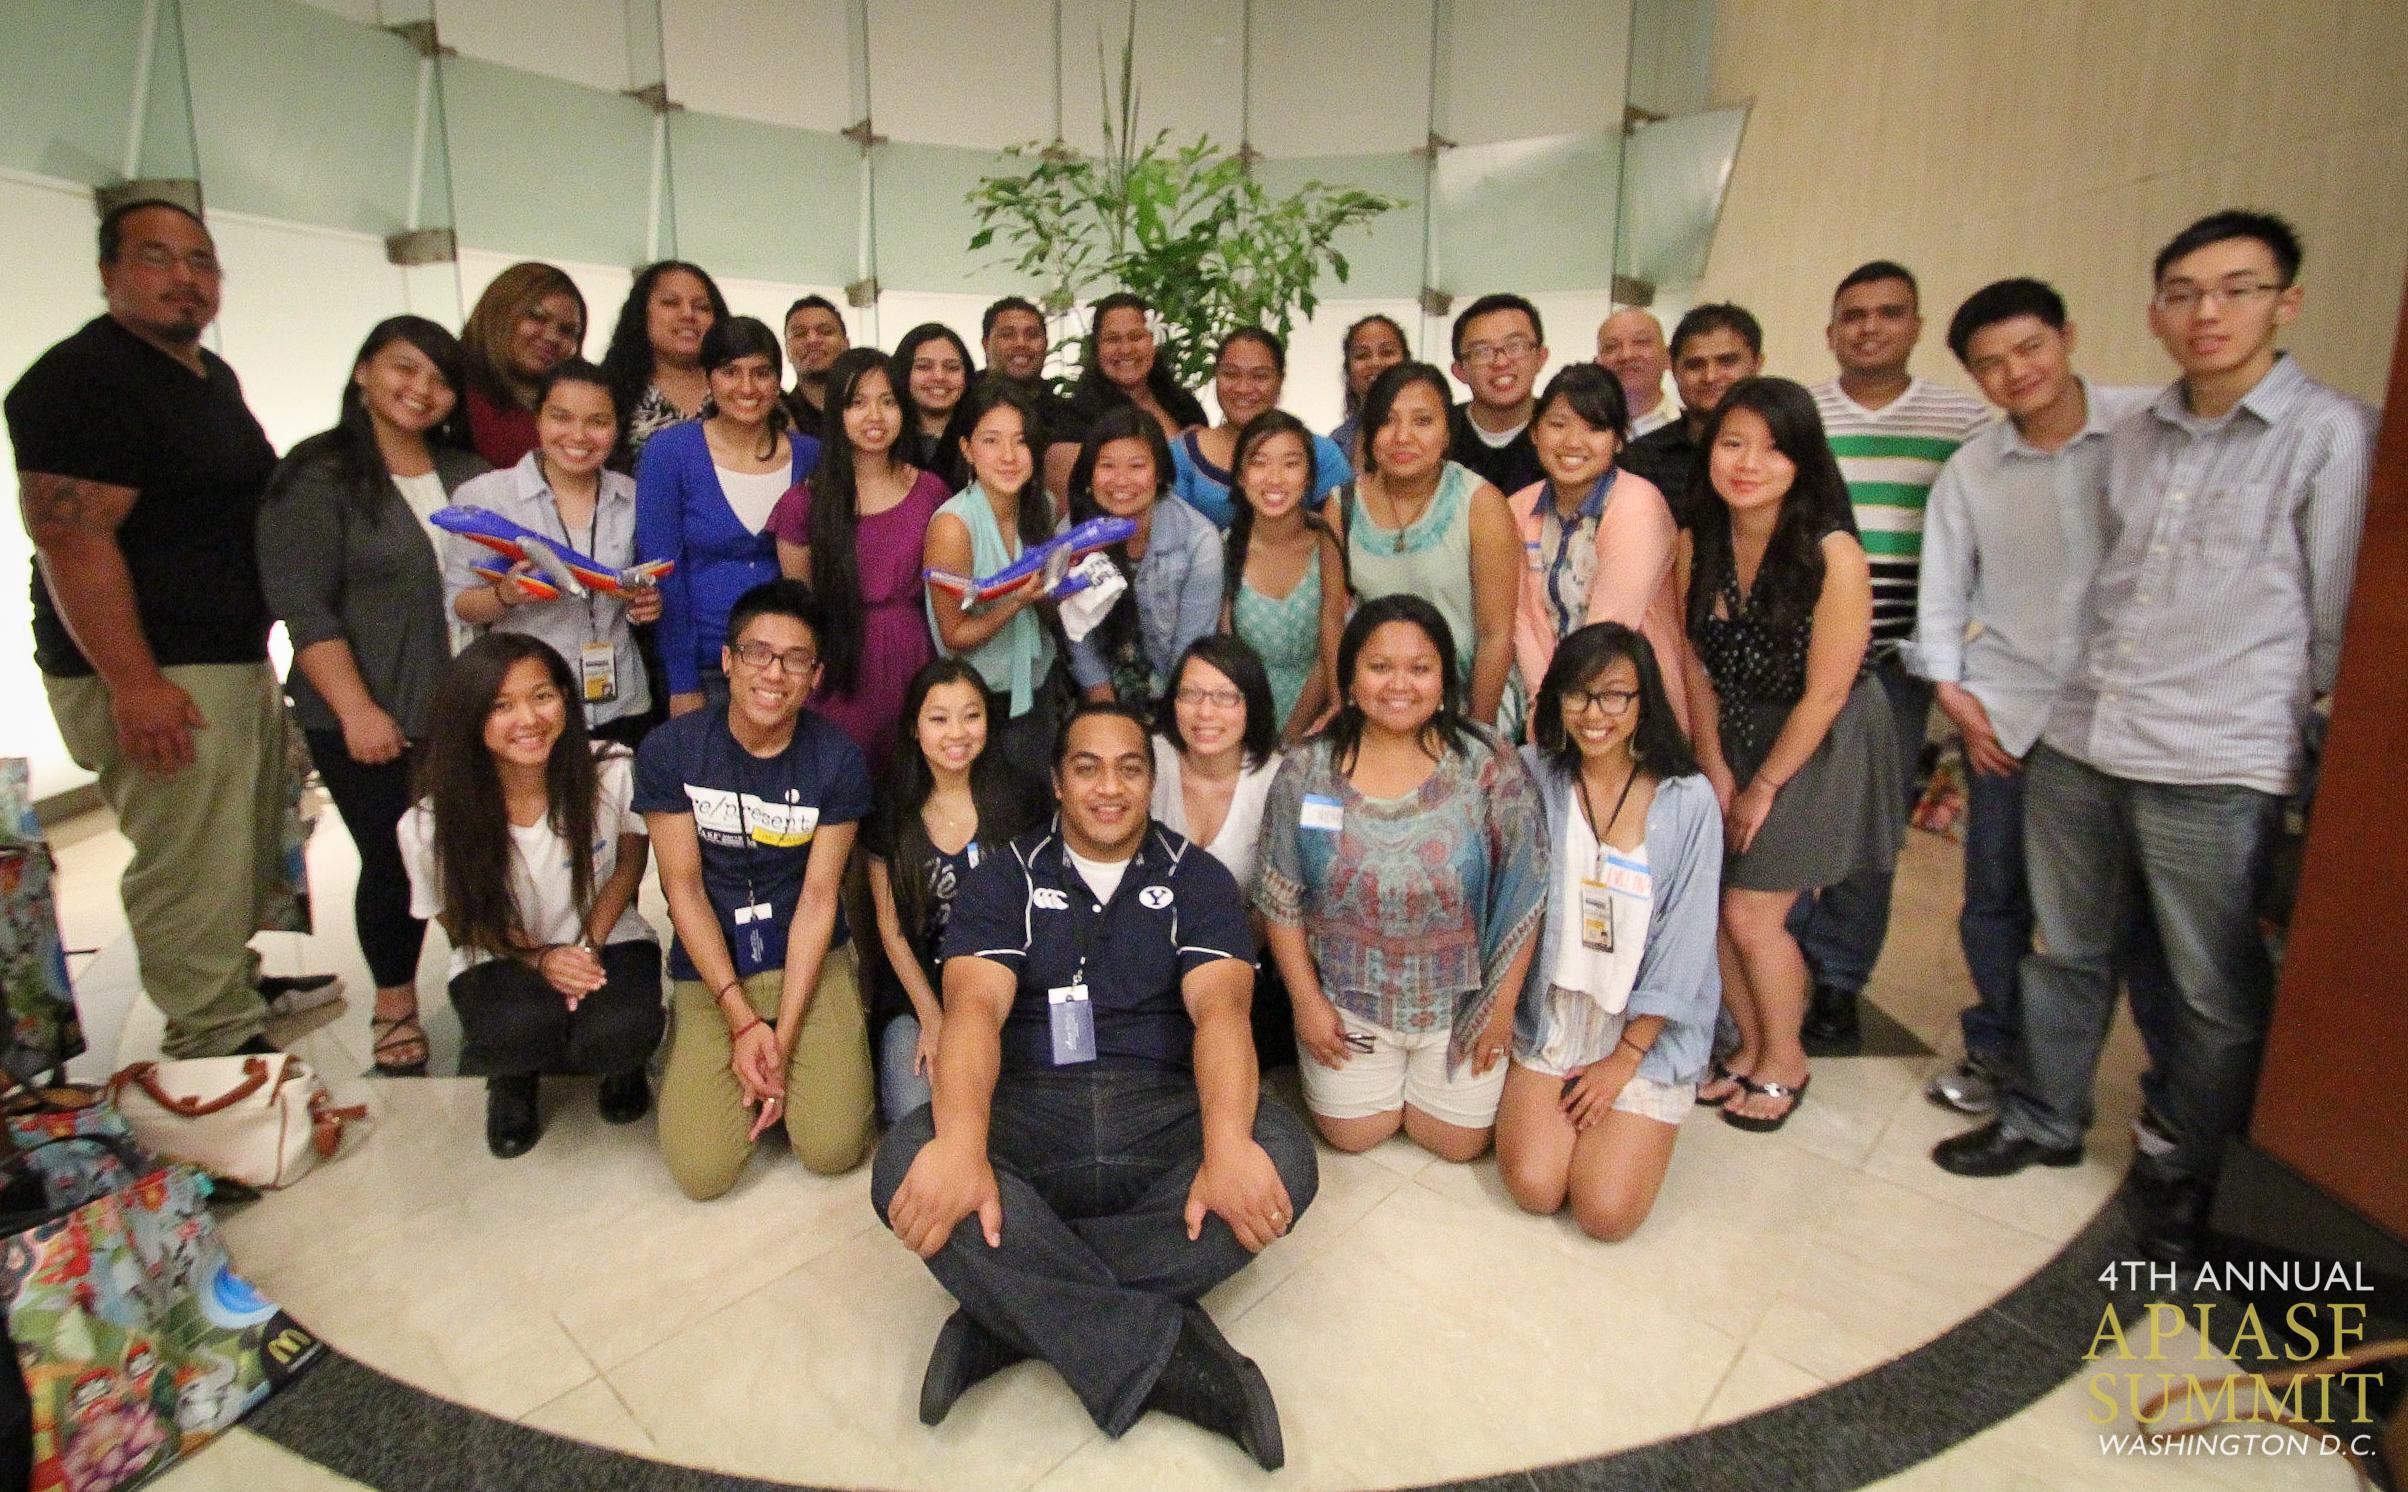 2013 APIASF Higher Education Summit